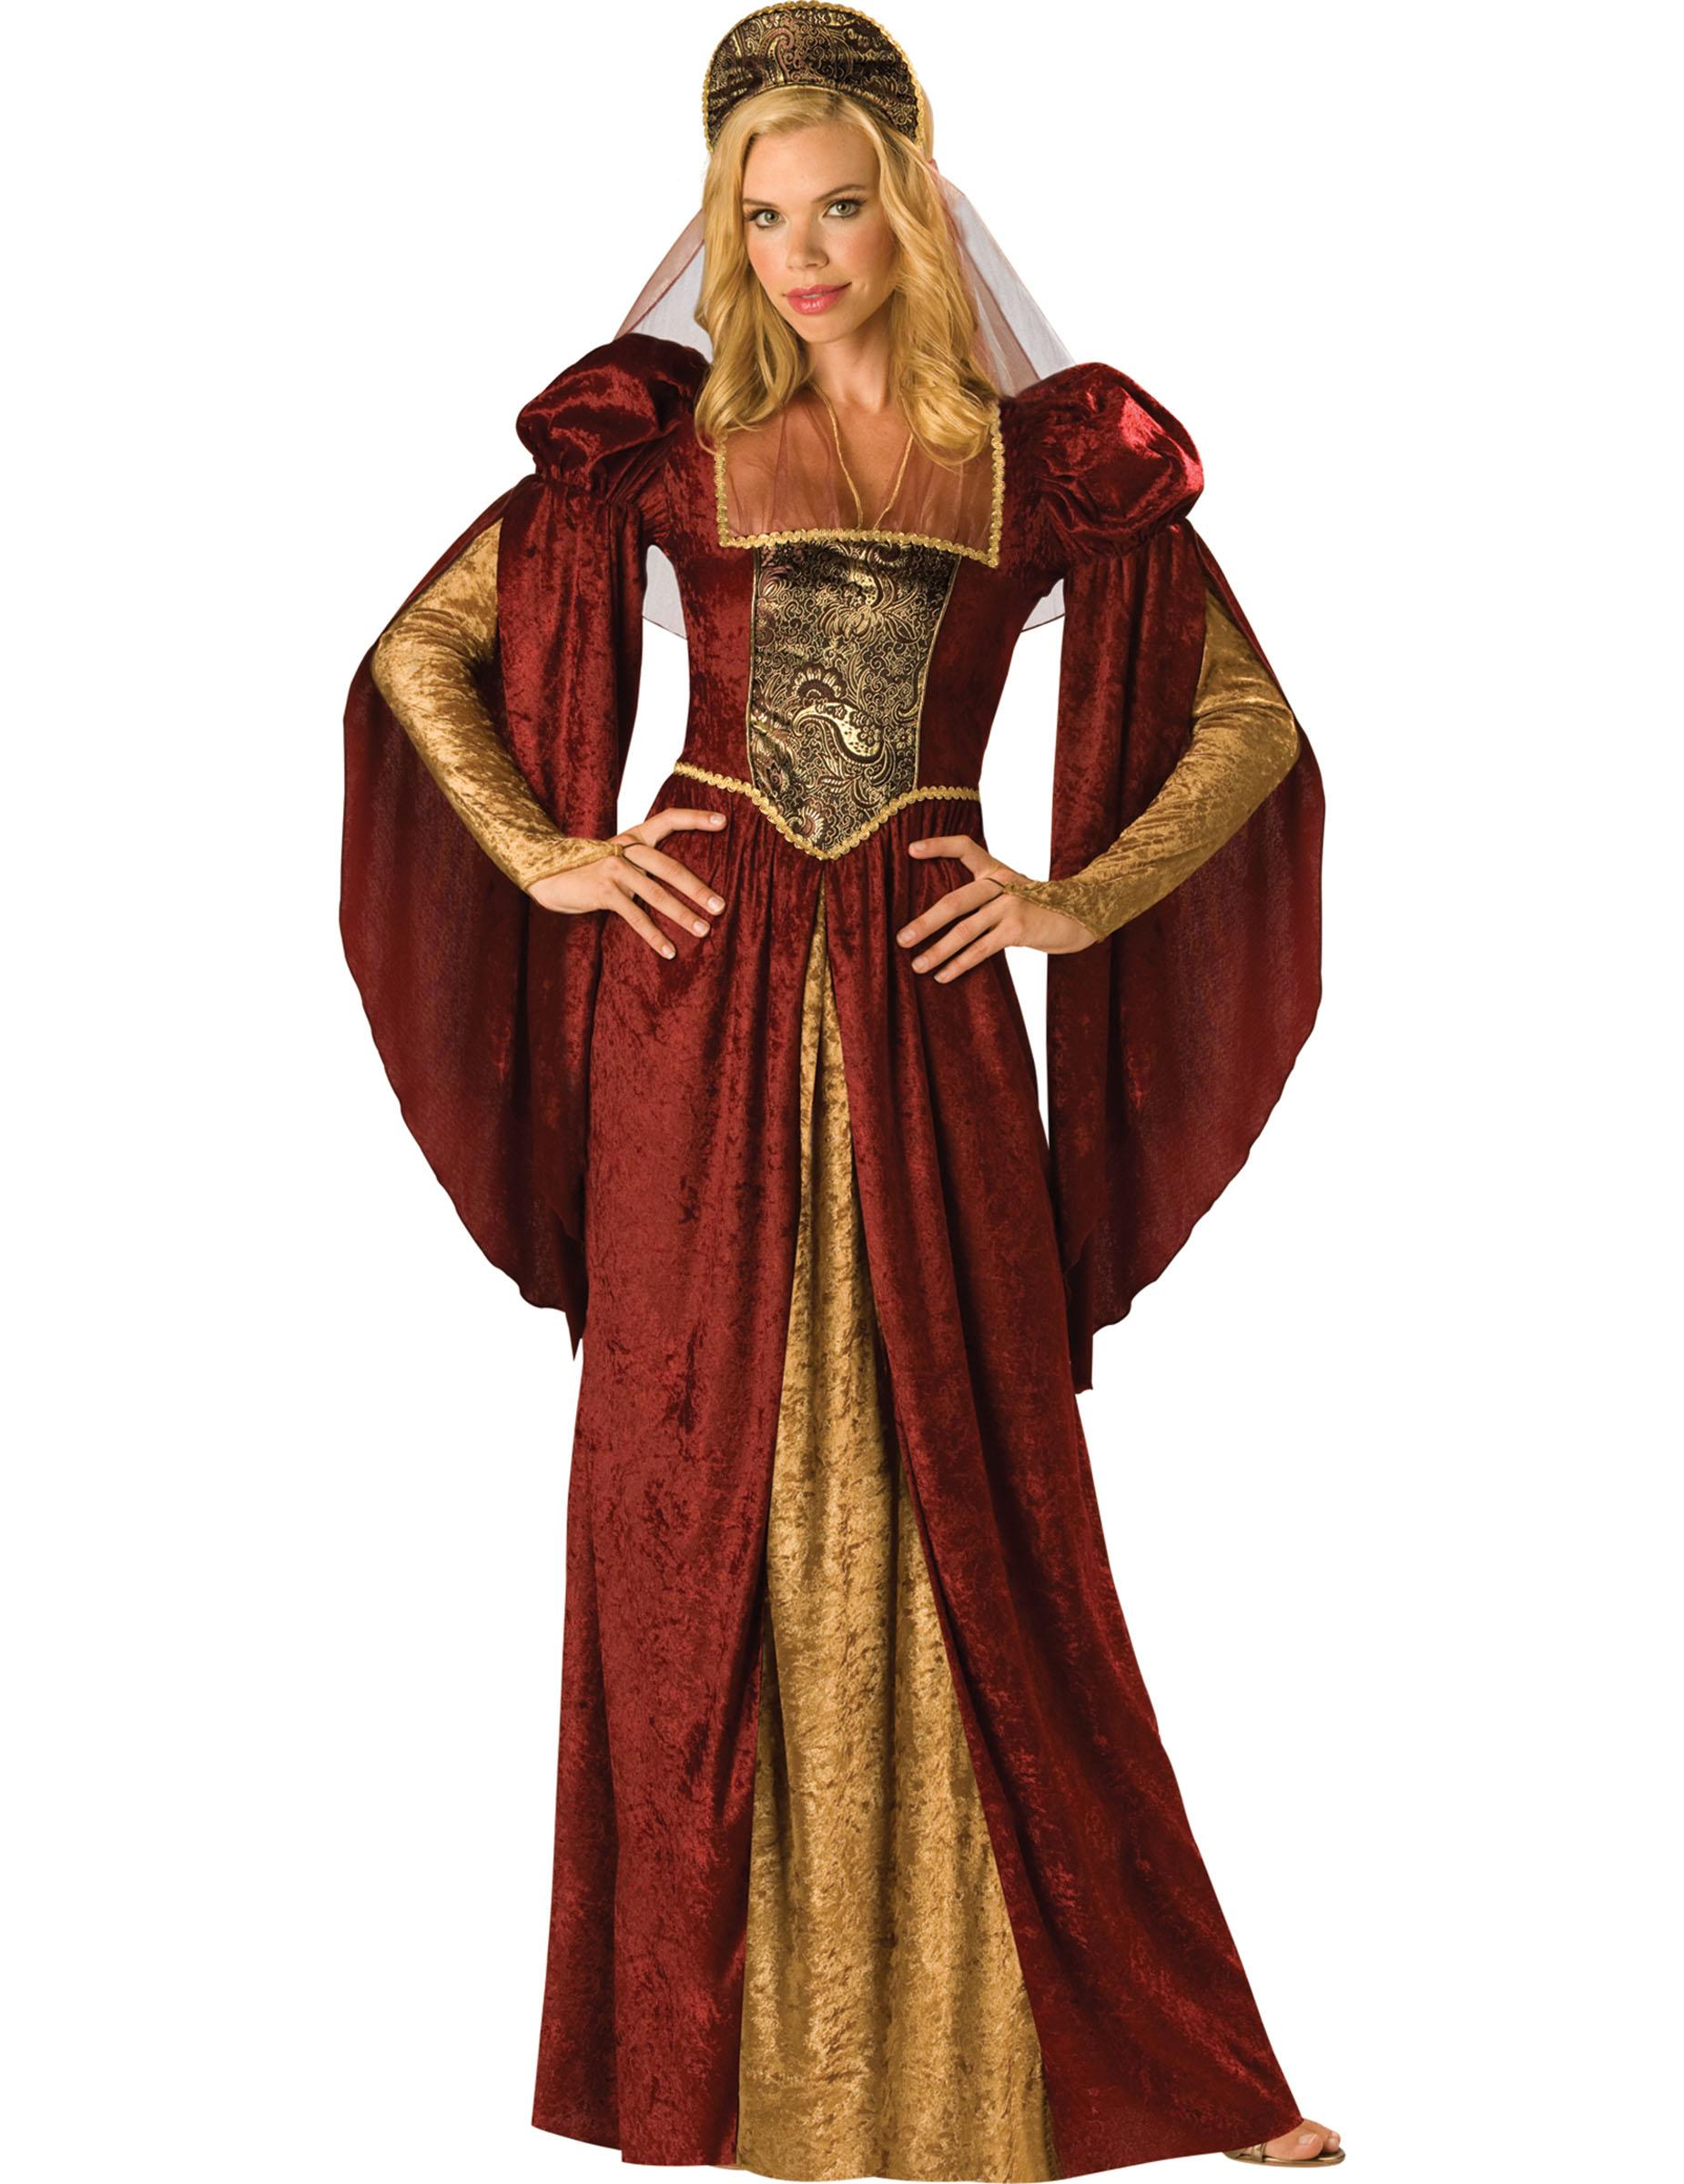 renaissance damenkost m burgfr ulein kost m rot gold g nstige faschings kost me bei karneval. Black Bedroom Furniture Sets. Home Design Ideas